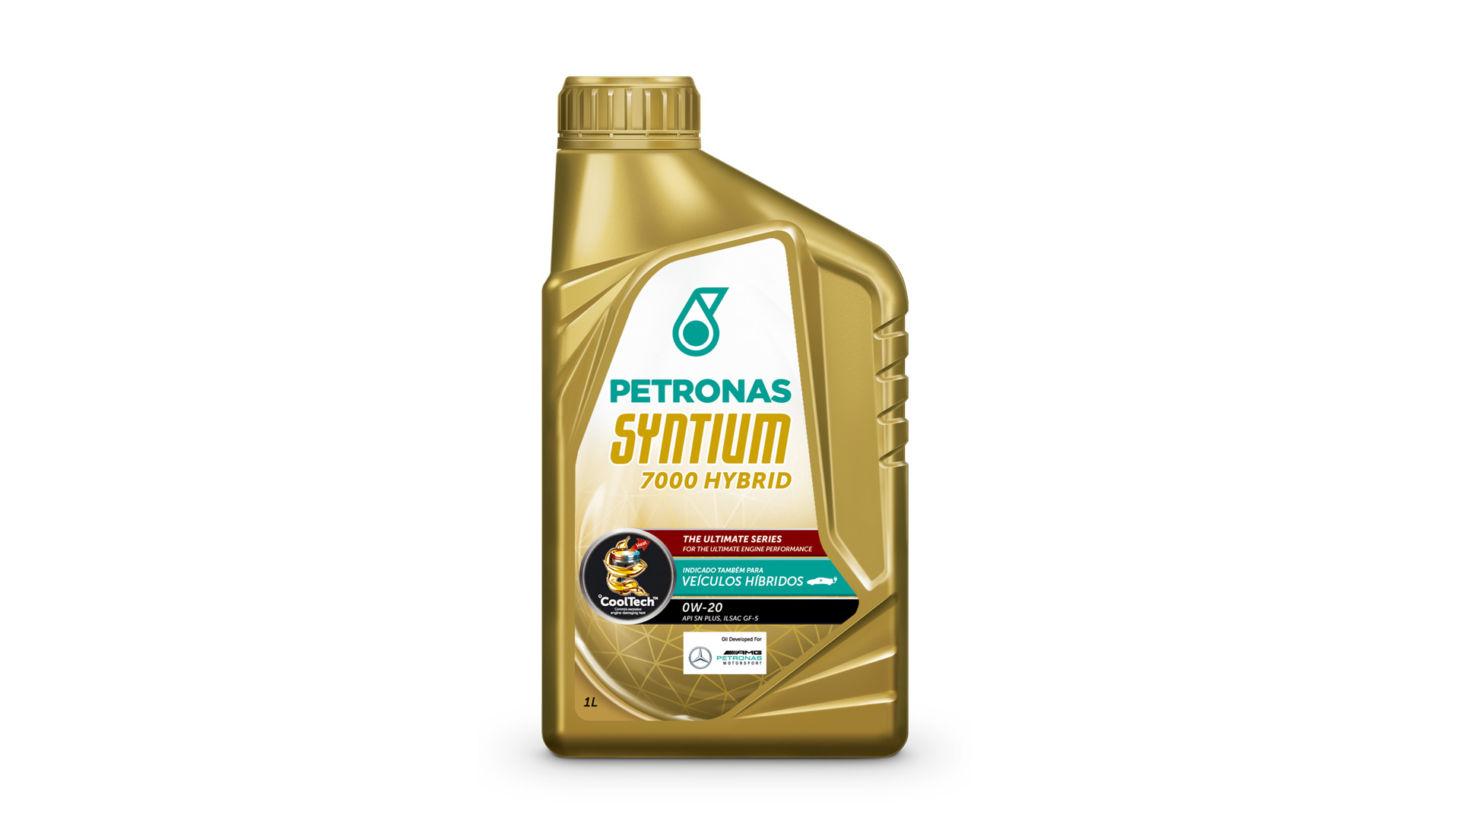 lubrificante petronas syntium 7000 hybrid